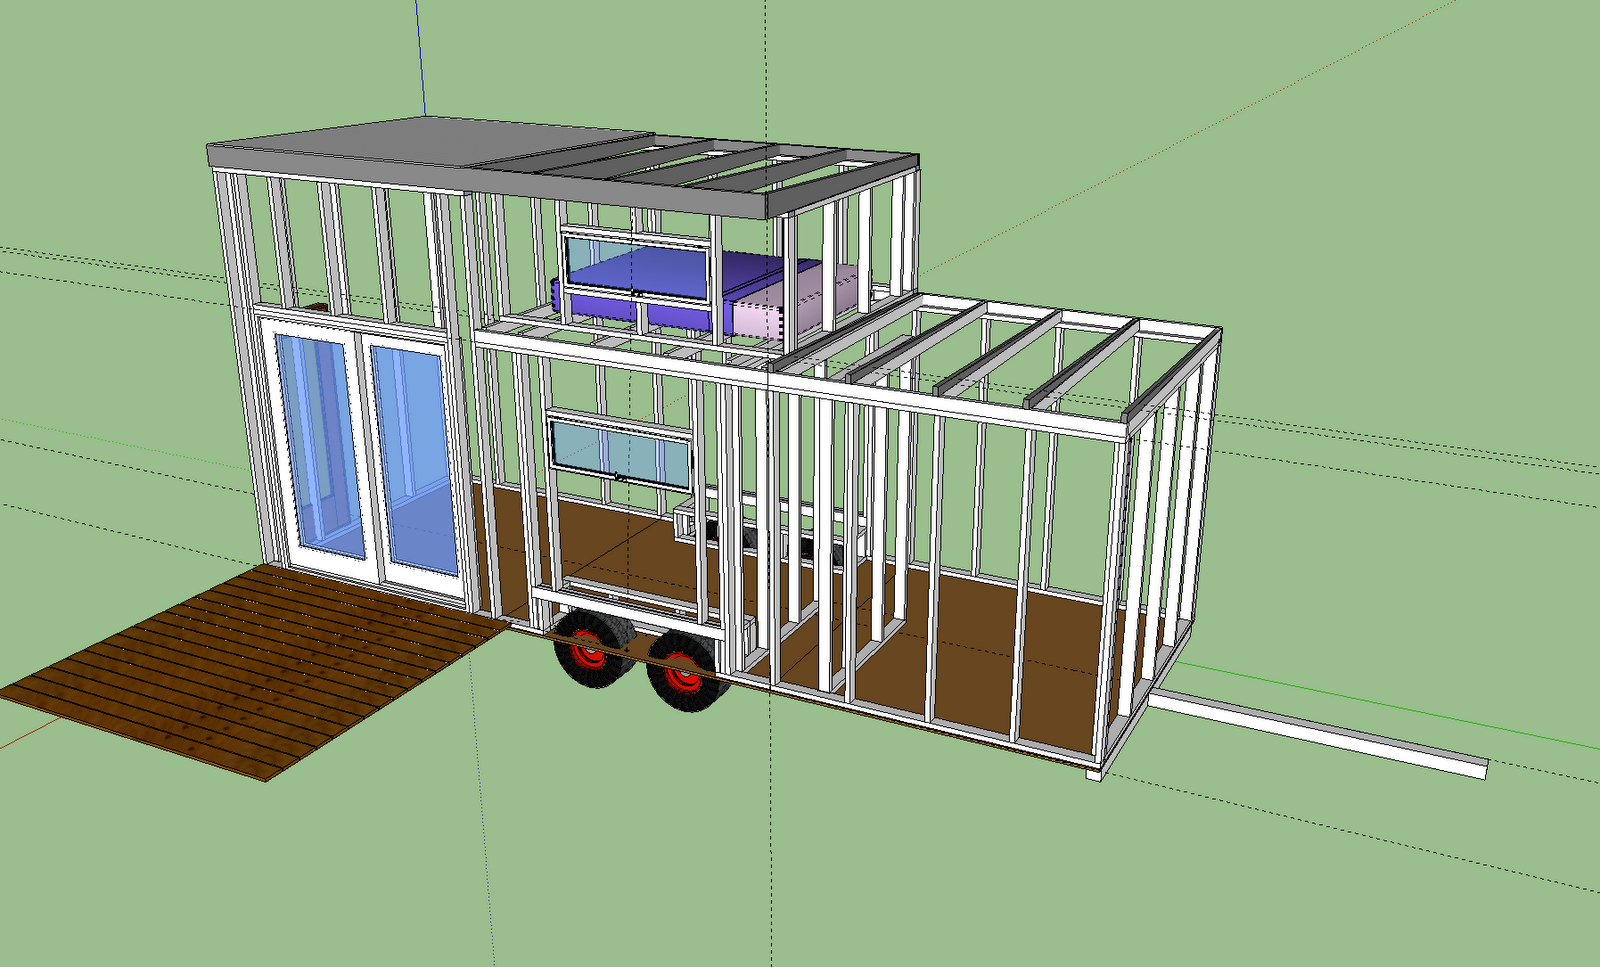 Inspiring Free Tiny House On Wheels Plans 12 Photo Home Plans Blueprints